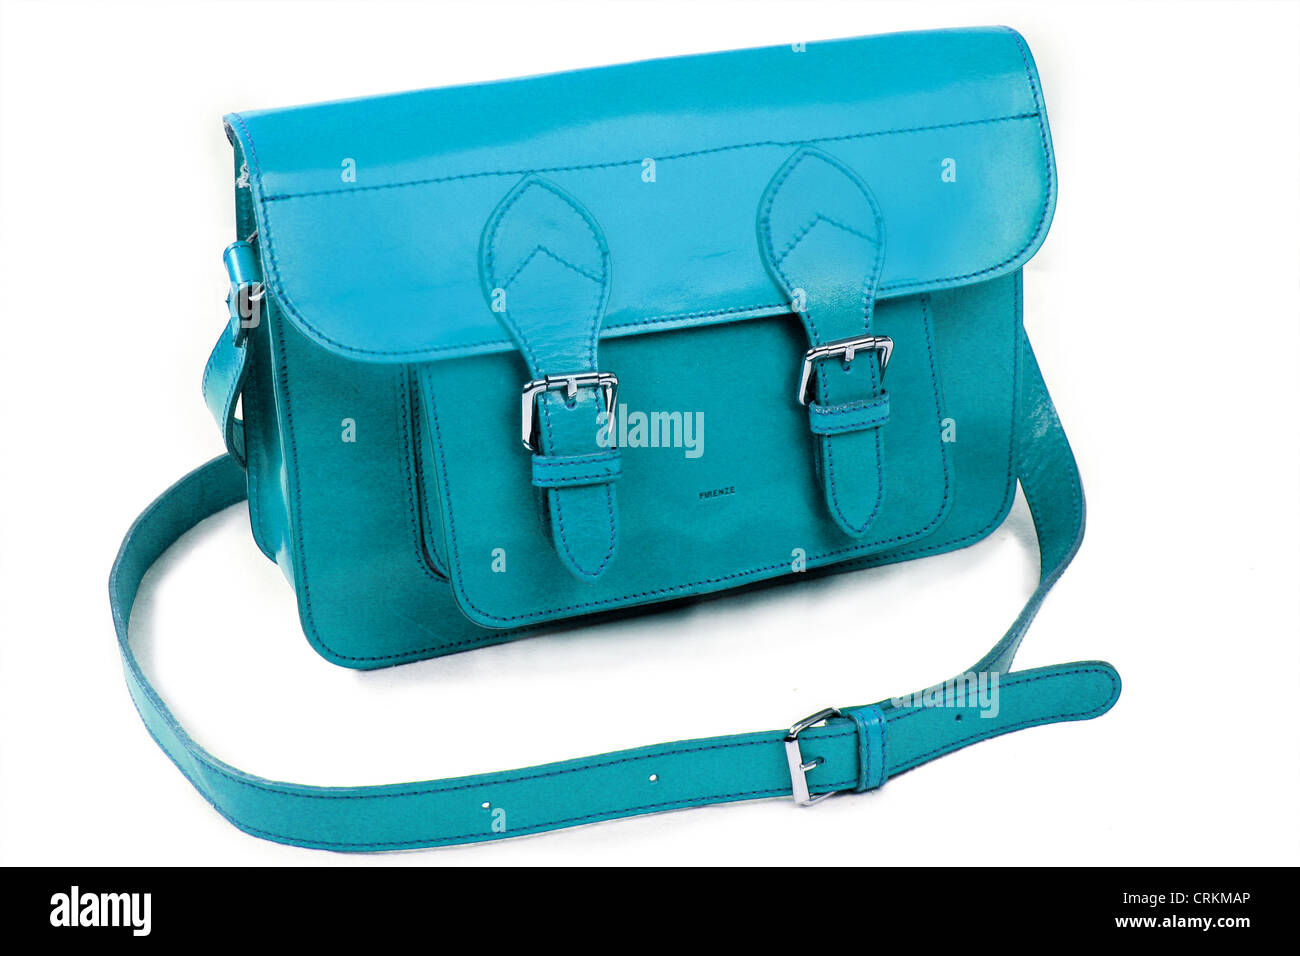 99e35cb1bf88a Hellblaue Handtasche Stockfotos   Hellblaue Handtasche Bilder - Alamy